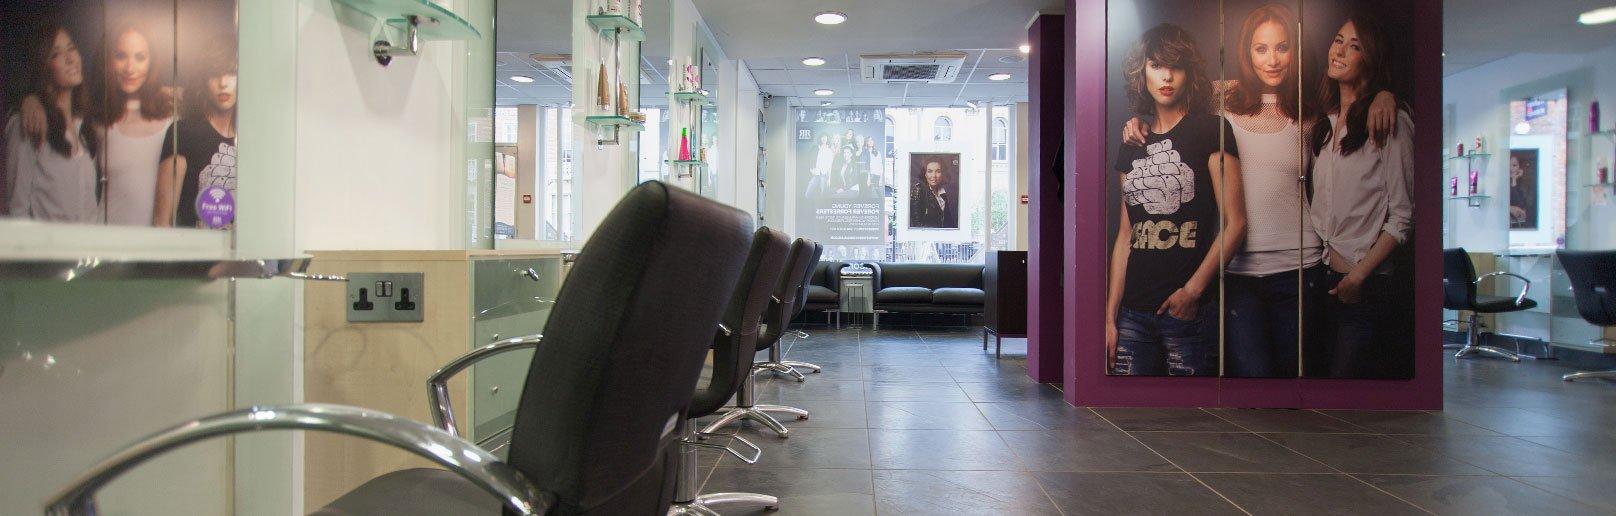 Forresters Abingdon hair salon interior view 1